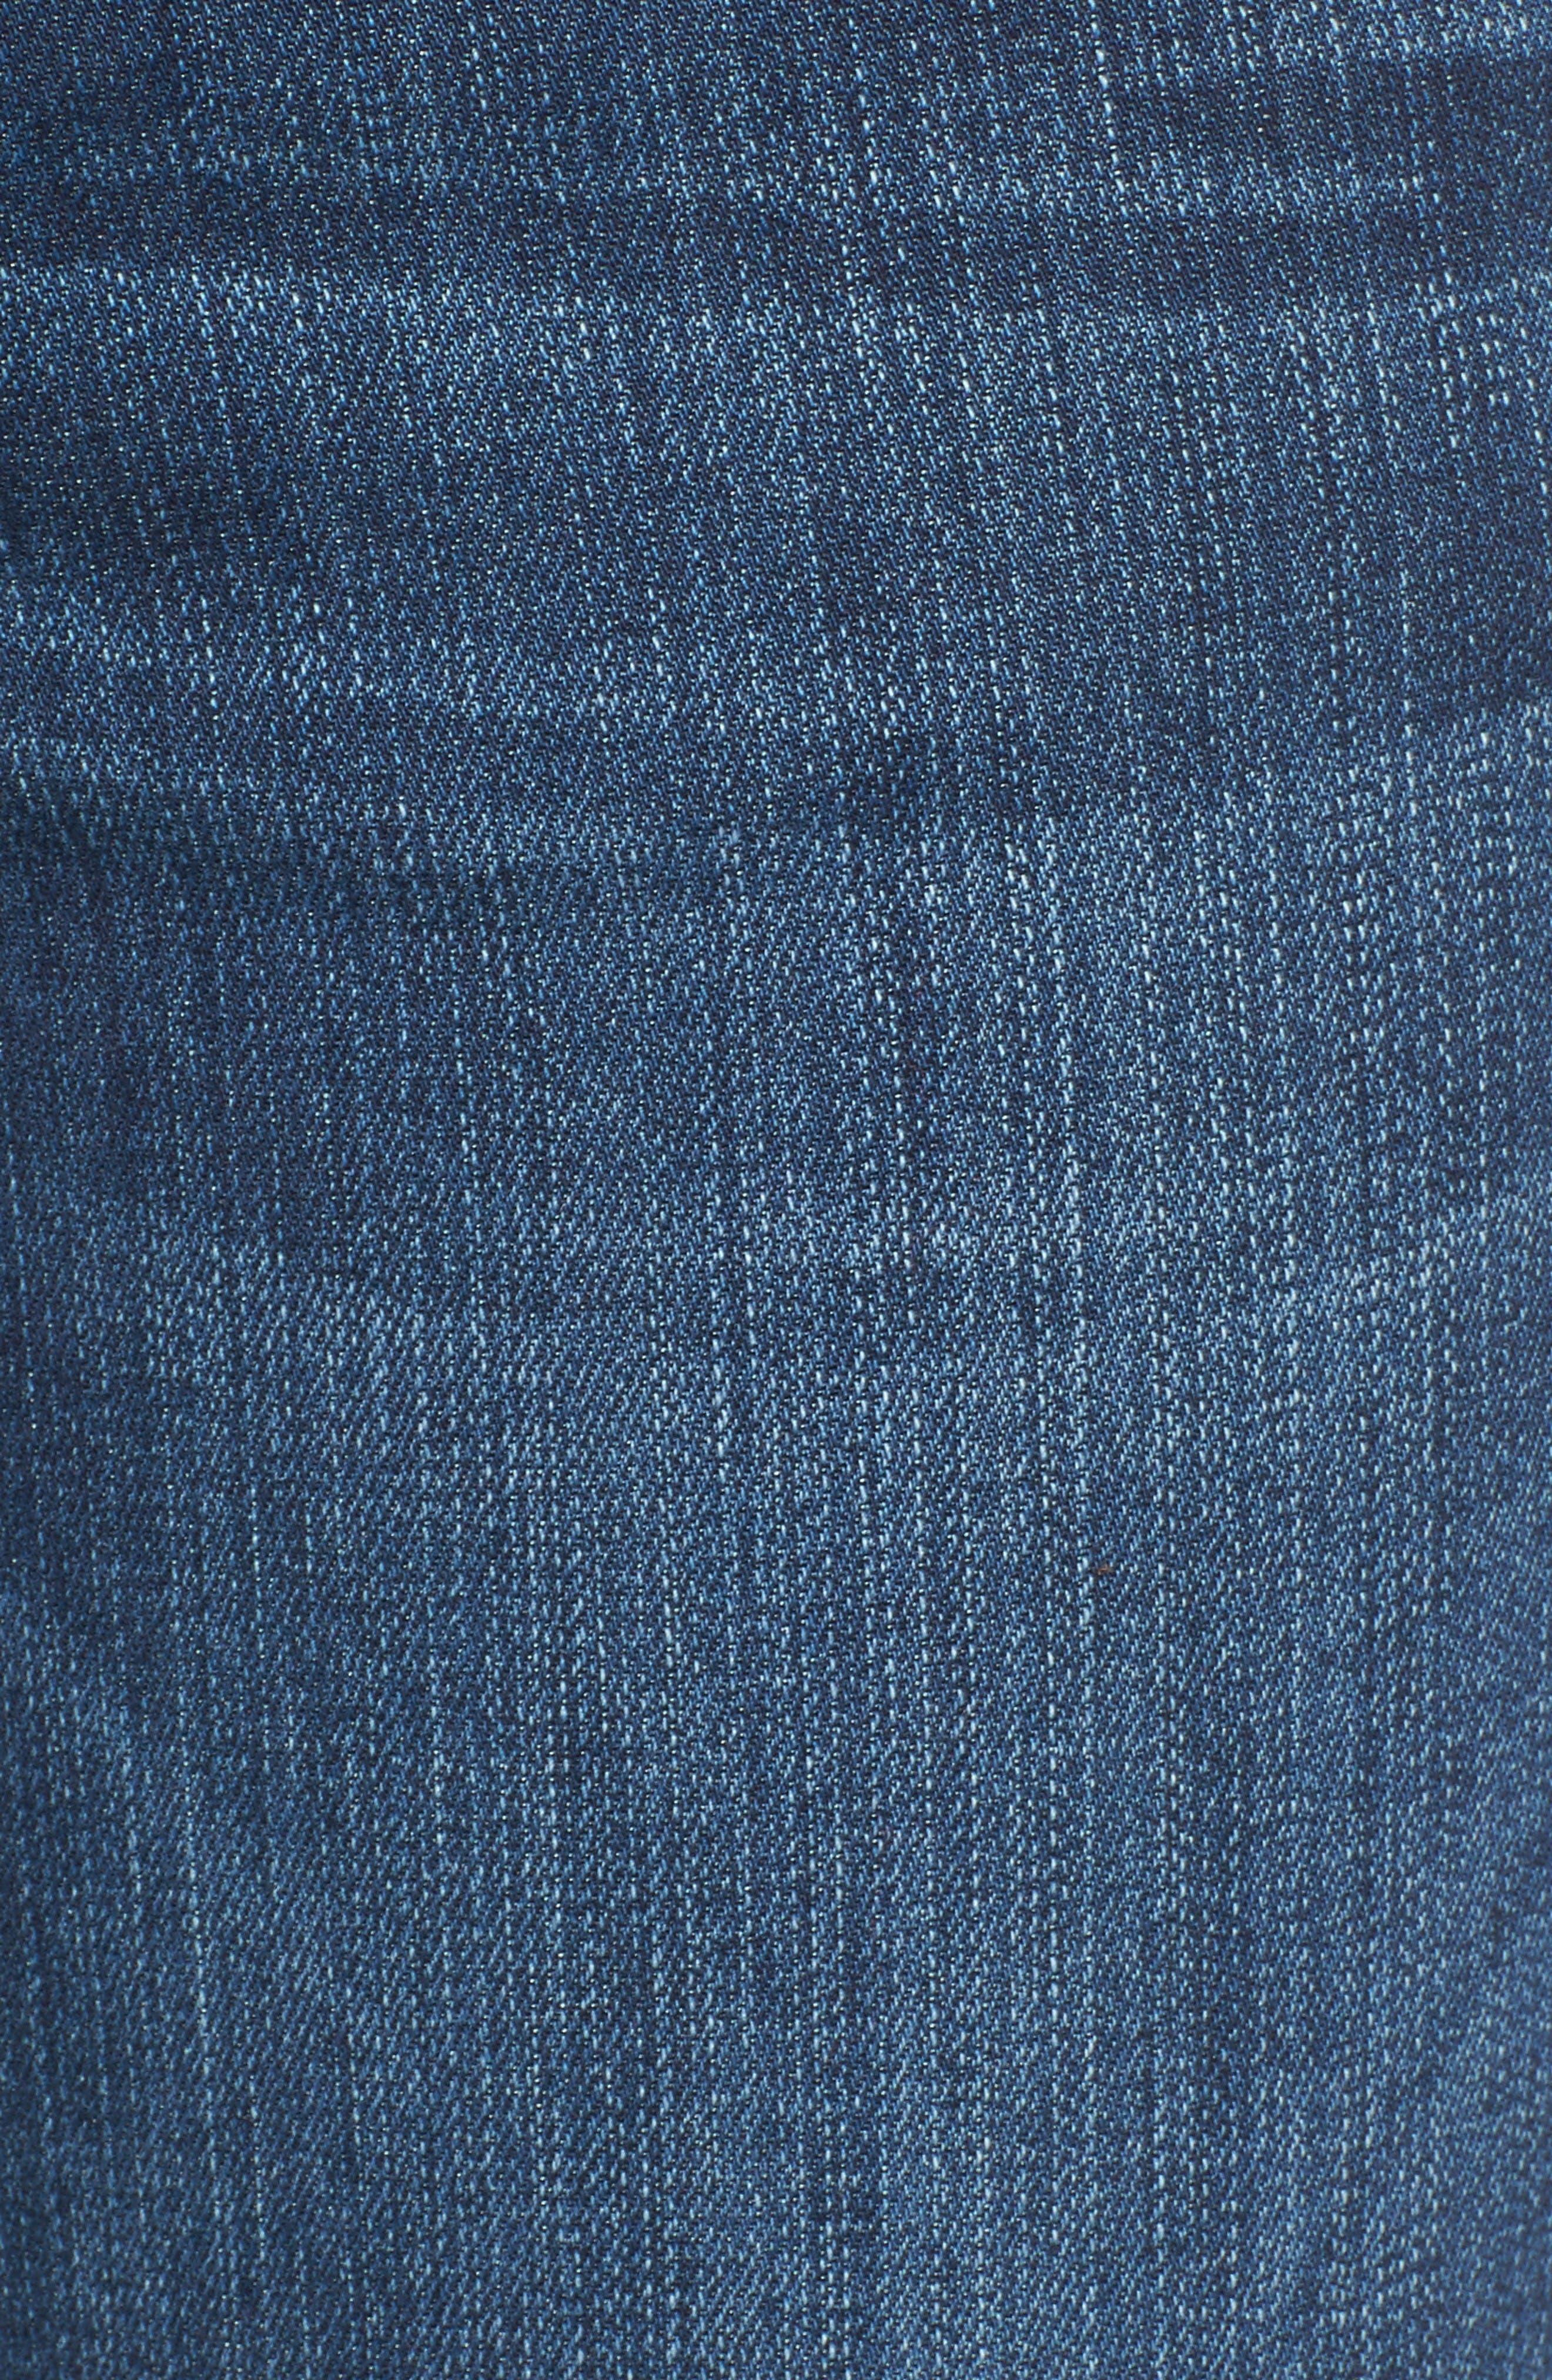 Alternate Image 5  - KUT from the Kloth Diana Stretch Skinny Jeans (Moderation) (Regular & Petite)